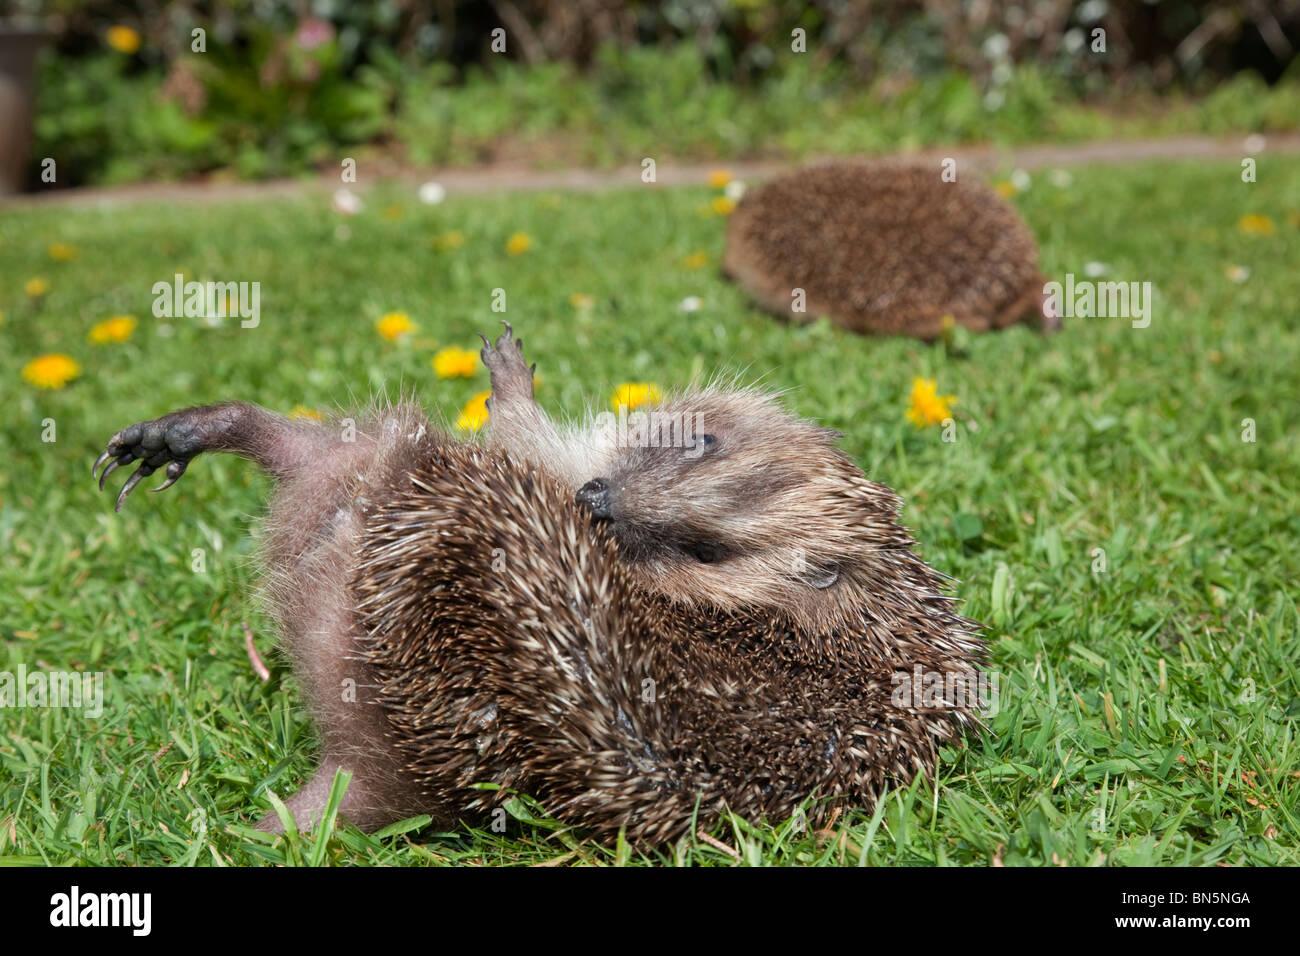 Hedgehog; Erinaceus europaeus; anointing itself - Stock Image